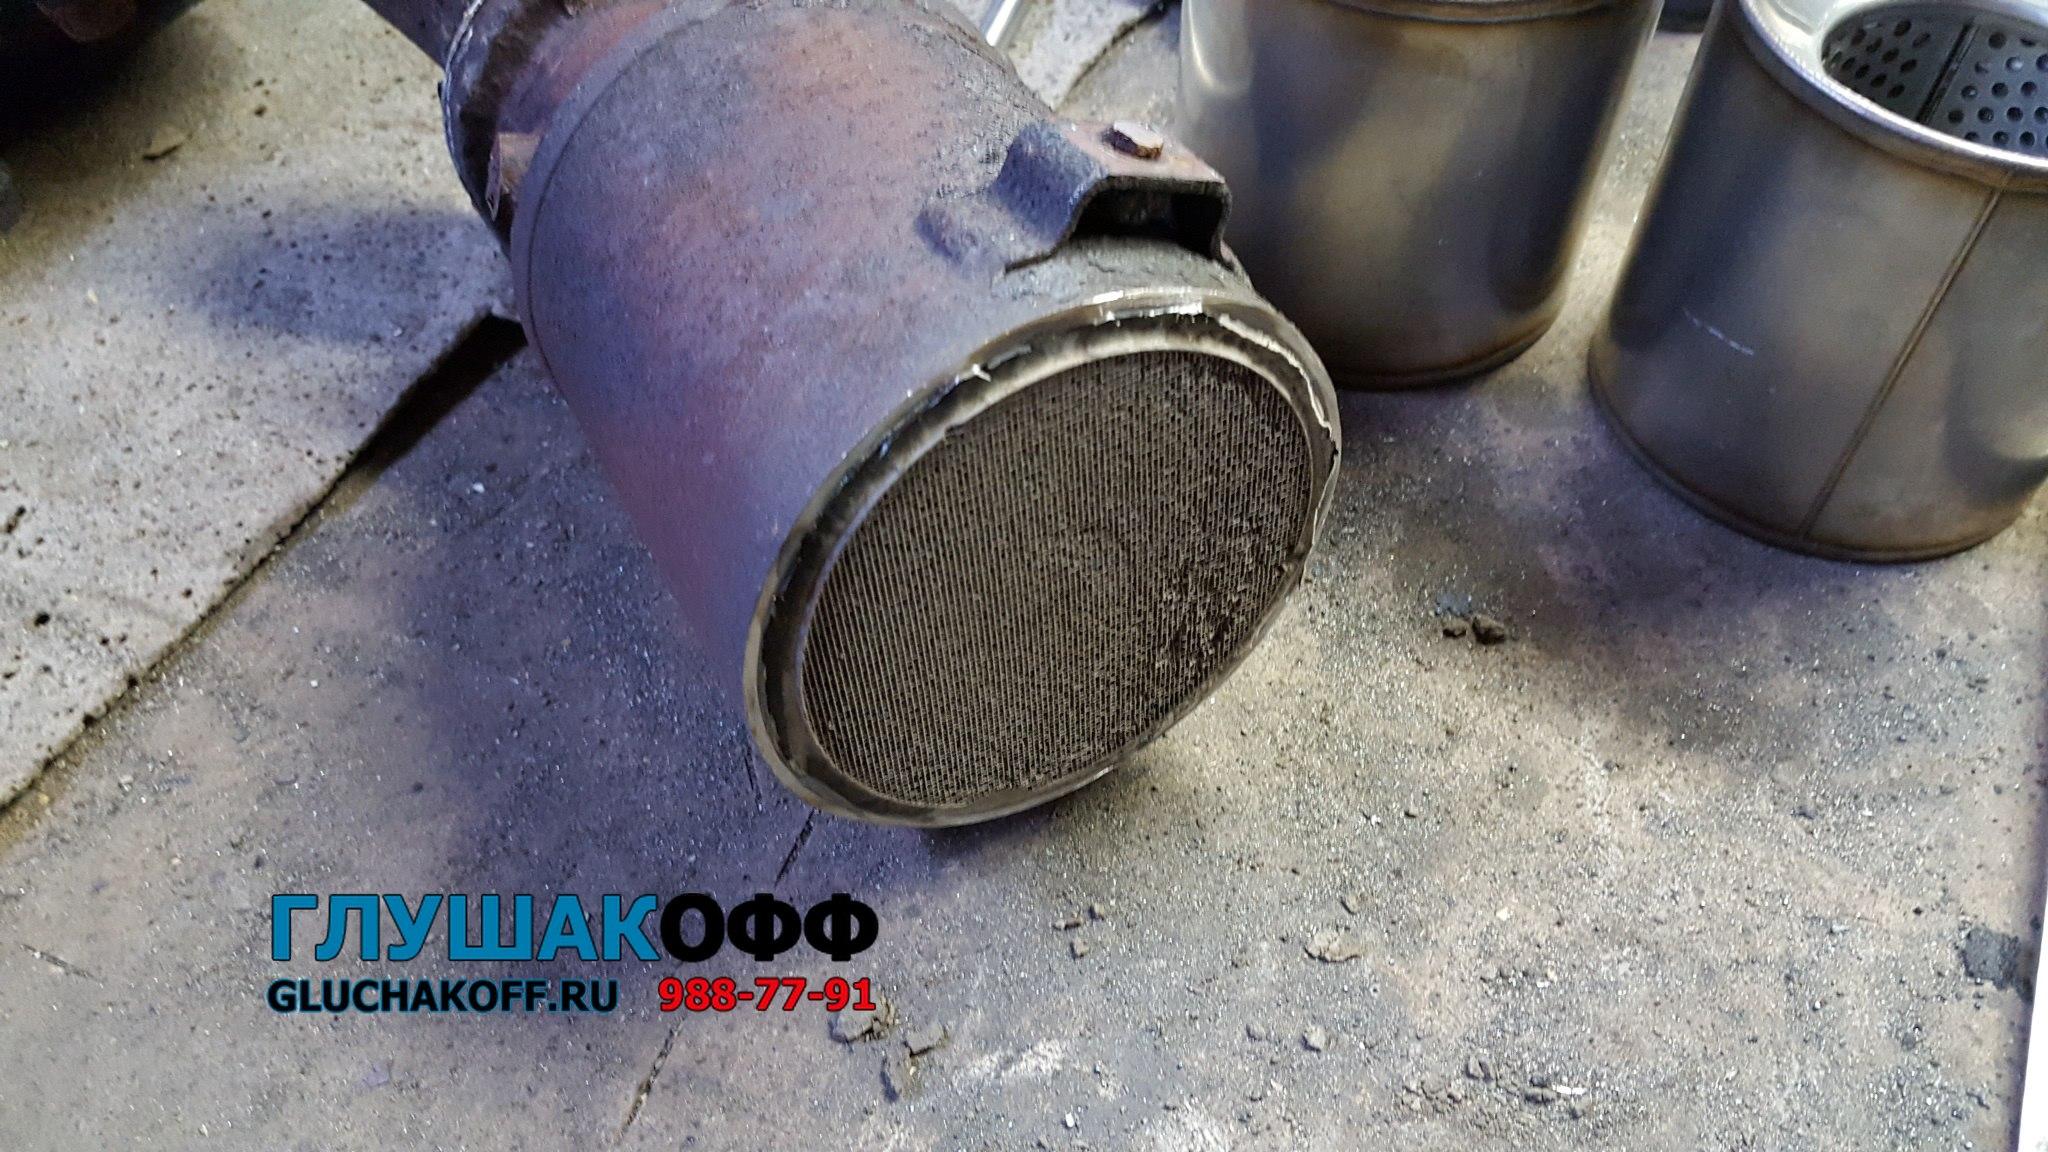 Процесс замены катализаторов на пламегасители в Hyundai Sonata V (NF) 3.3 V6